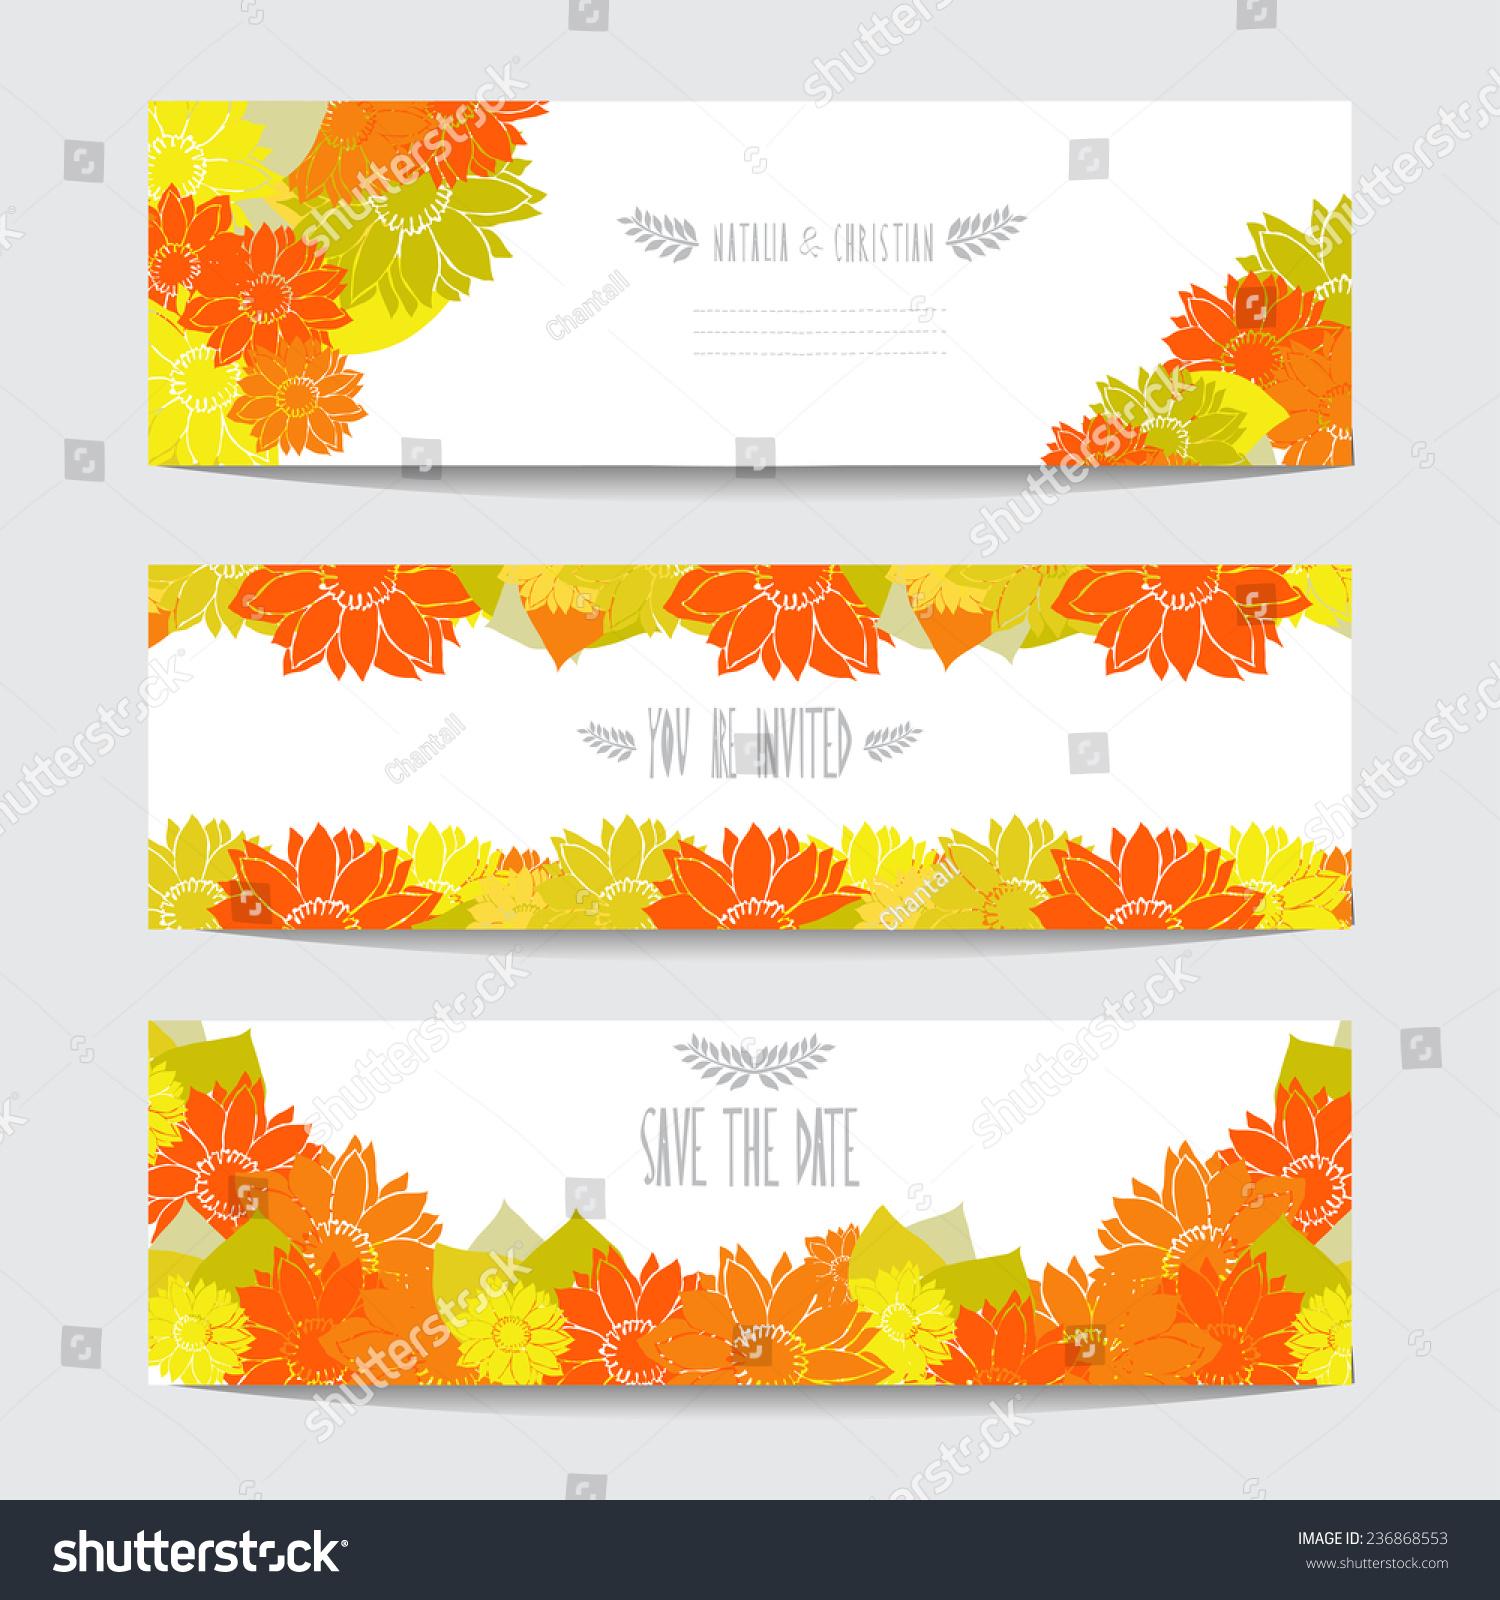 Elegant Cards Decorative Sunflowers Design Elements Stock ...